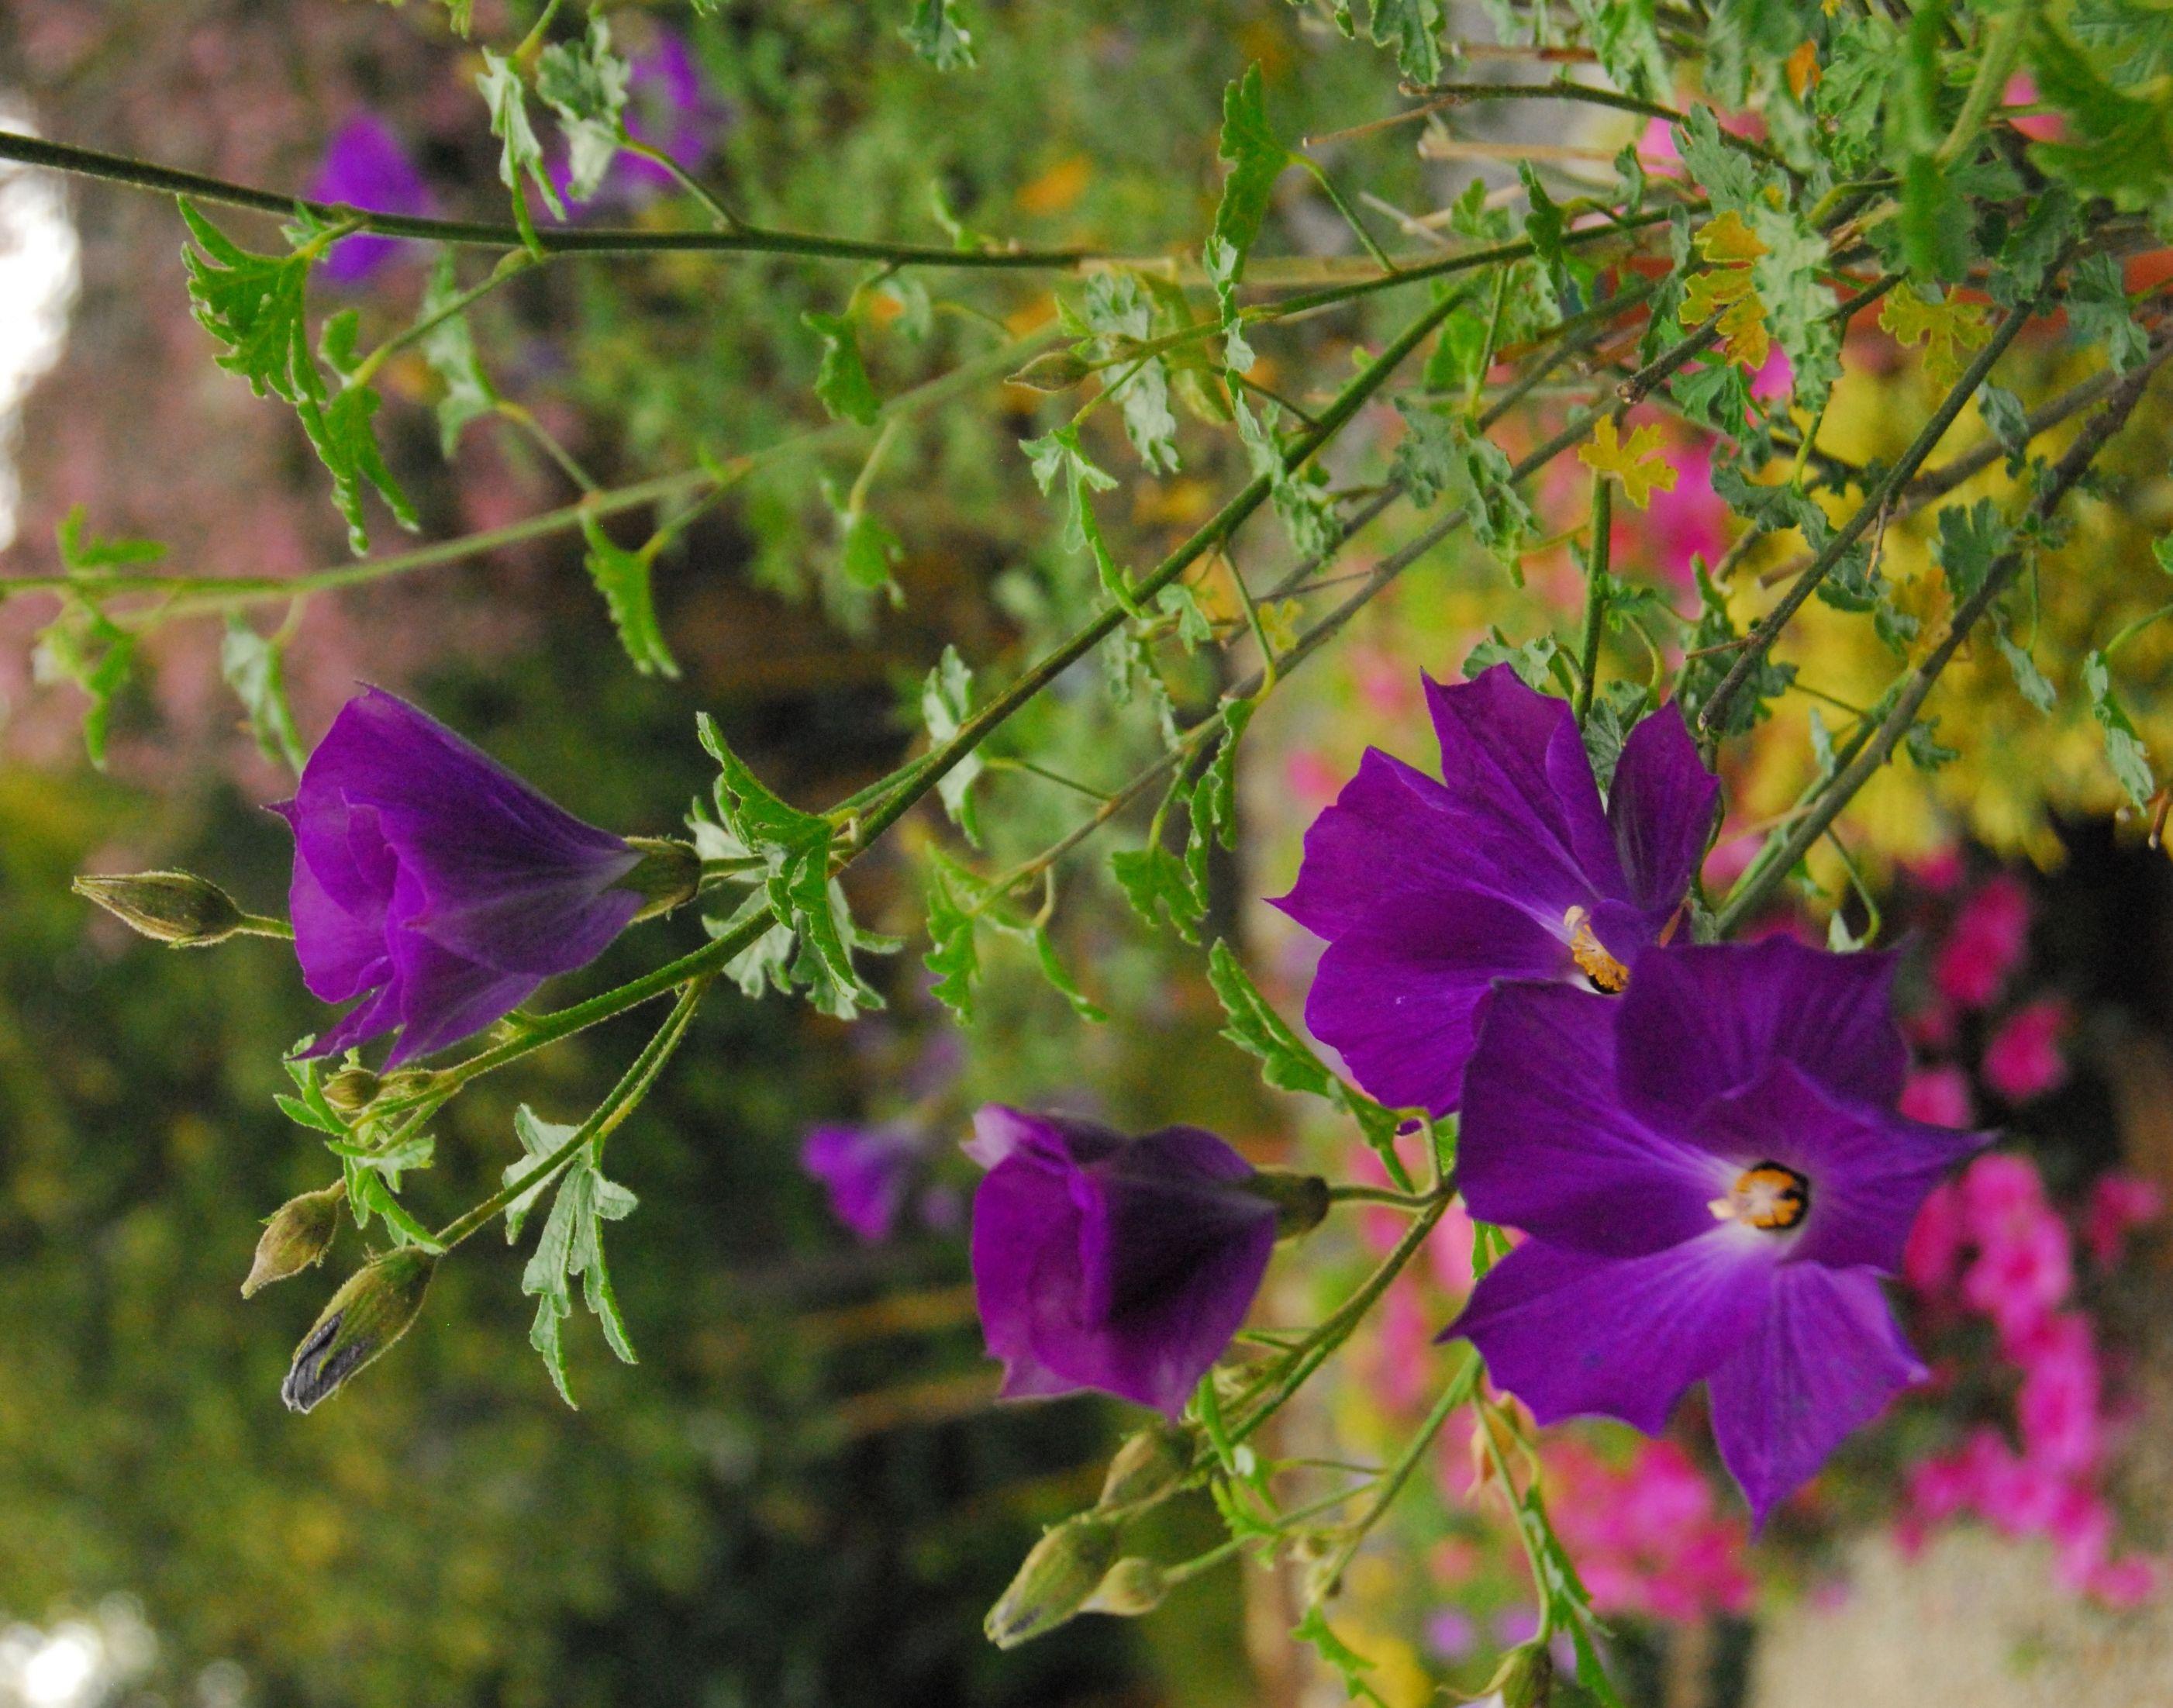 Leon's Purple Delight™ Lilac Hibiscus - Monrovia - Leon's Purple Delight™ Lilac Hibiscus